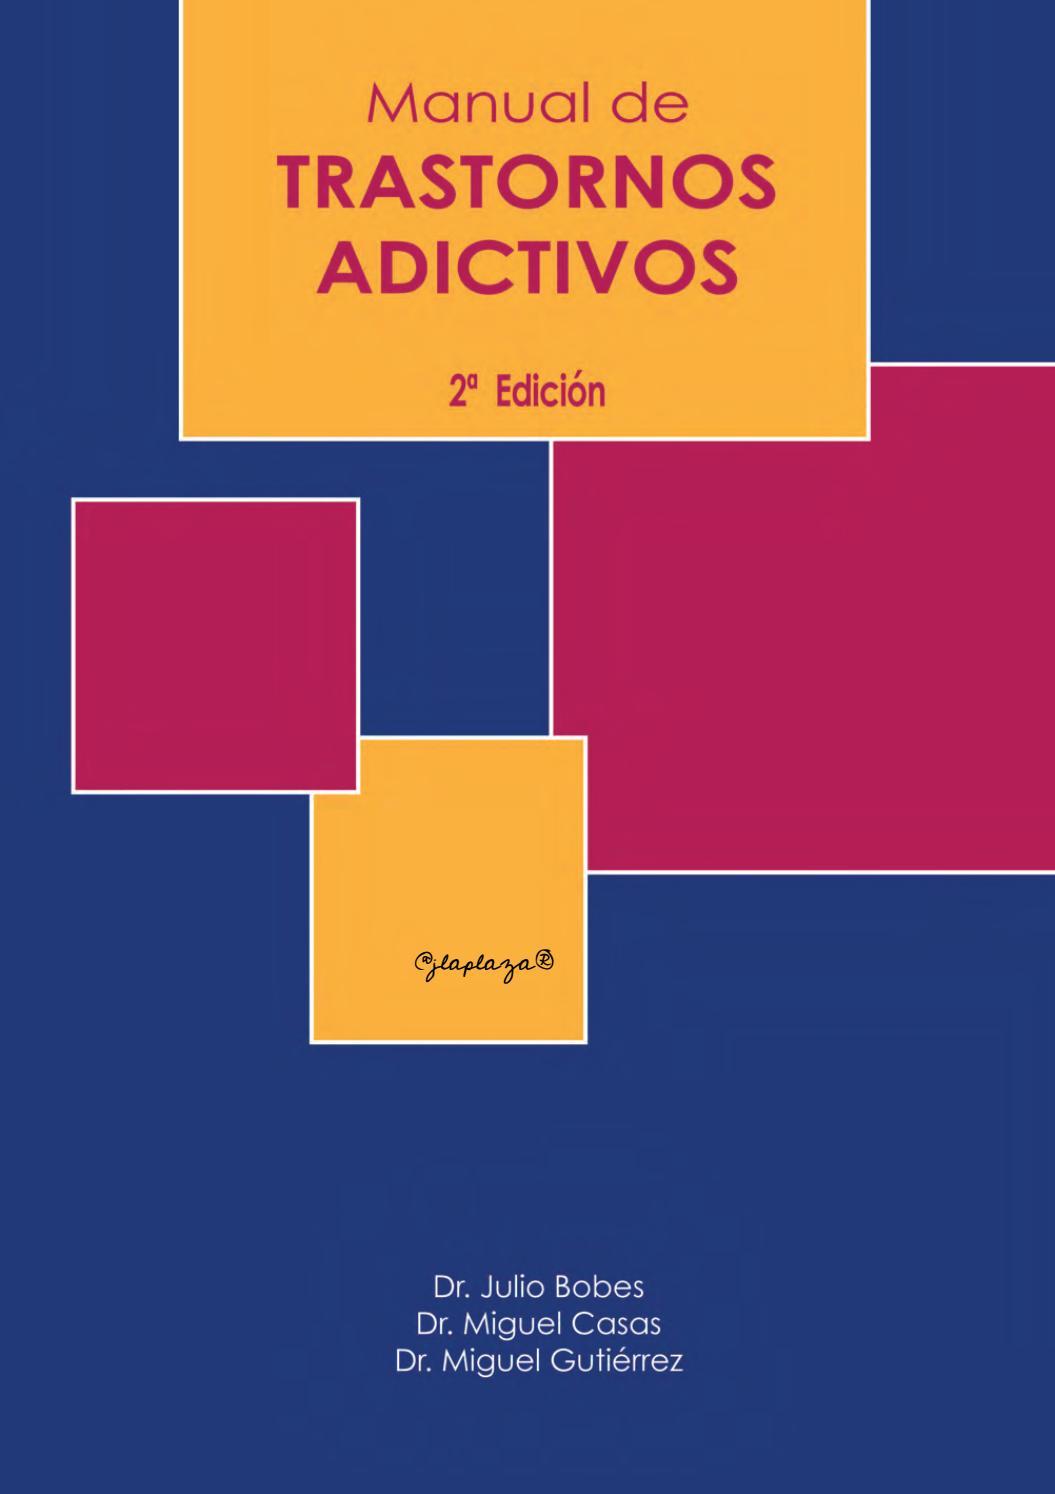 Manual de trastornos adictivos, 2da Edición – Julio Bobes